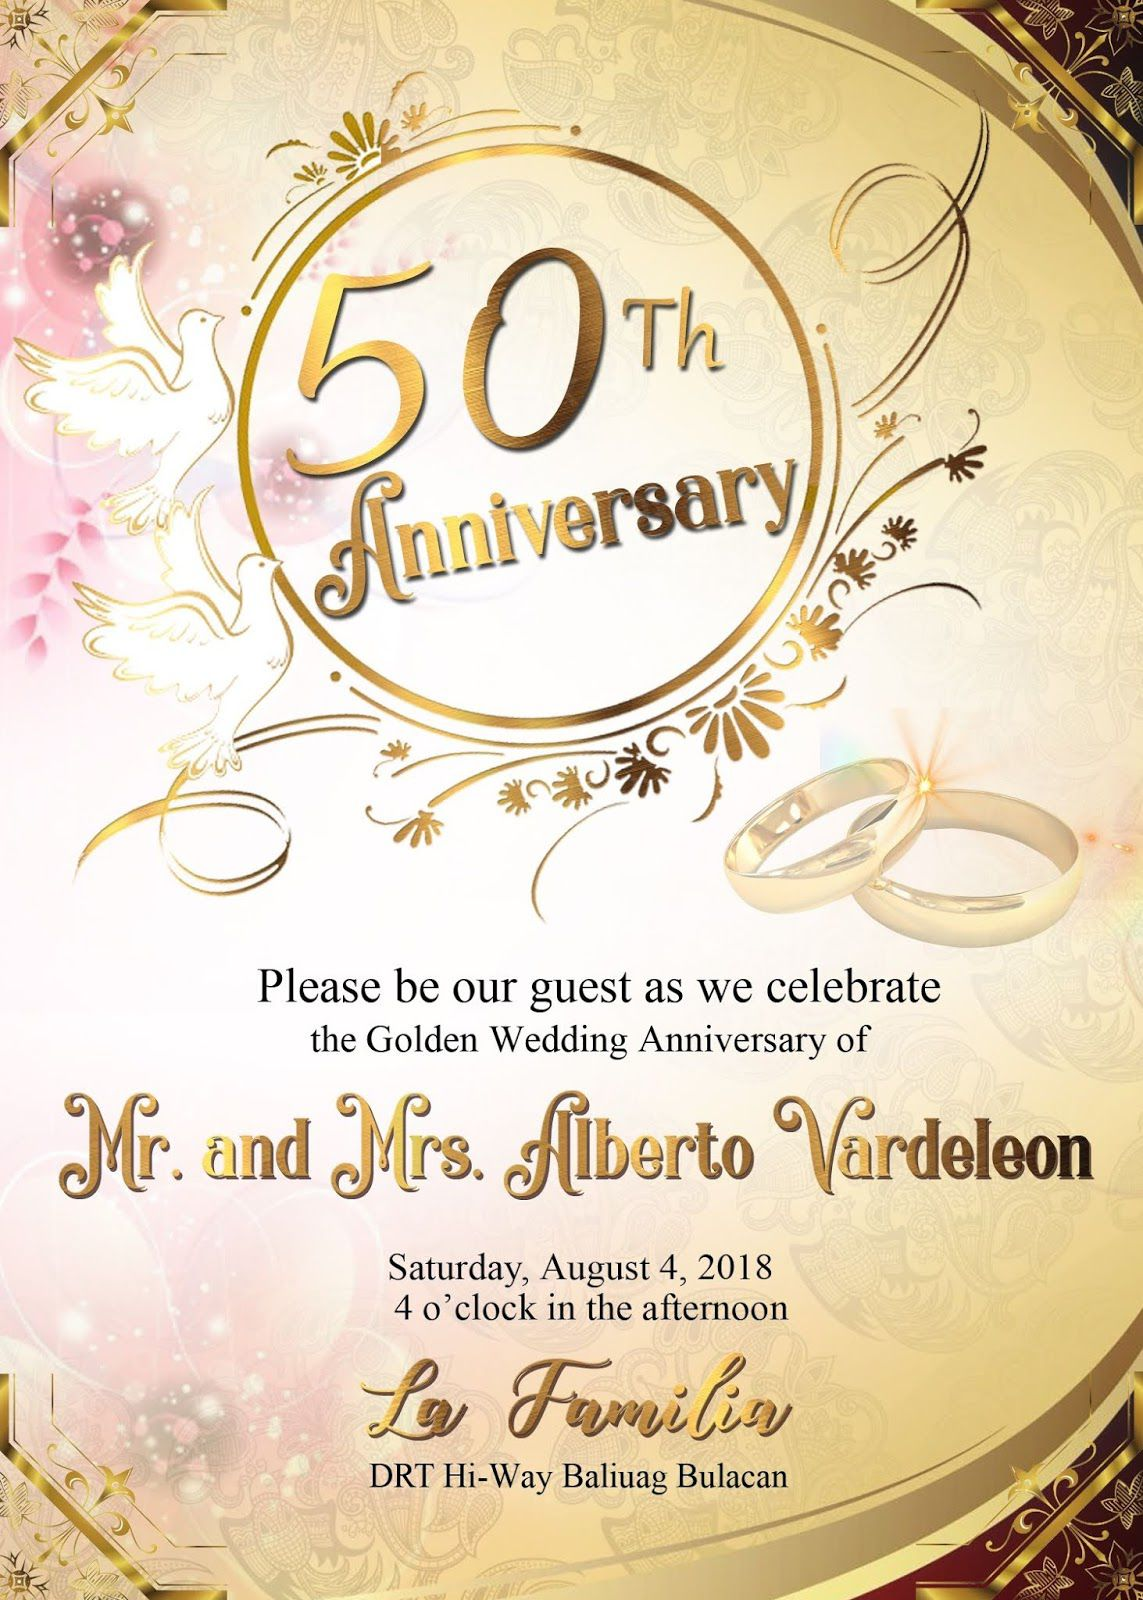 009 Formidable 50th Wedding Anniversary Invitation Card Template Sample  TemplatesFull